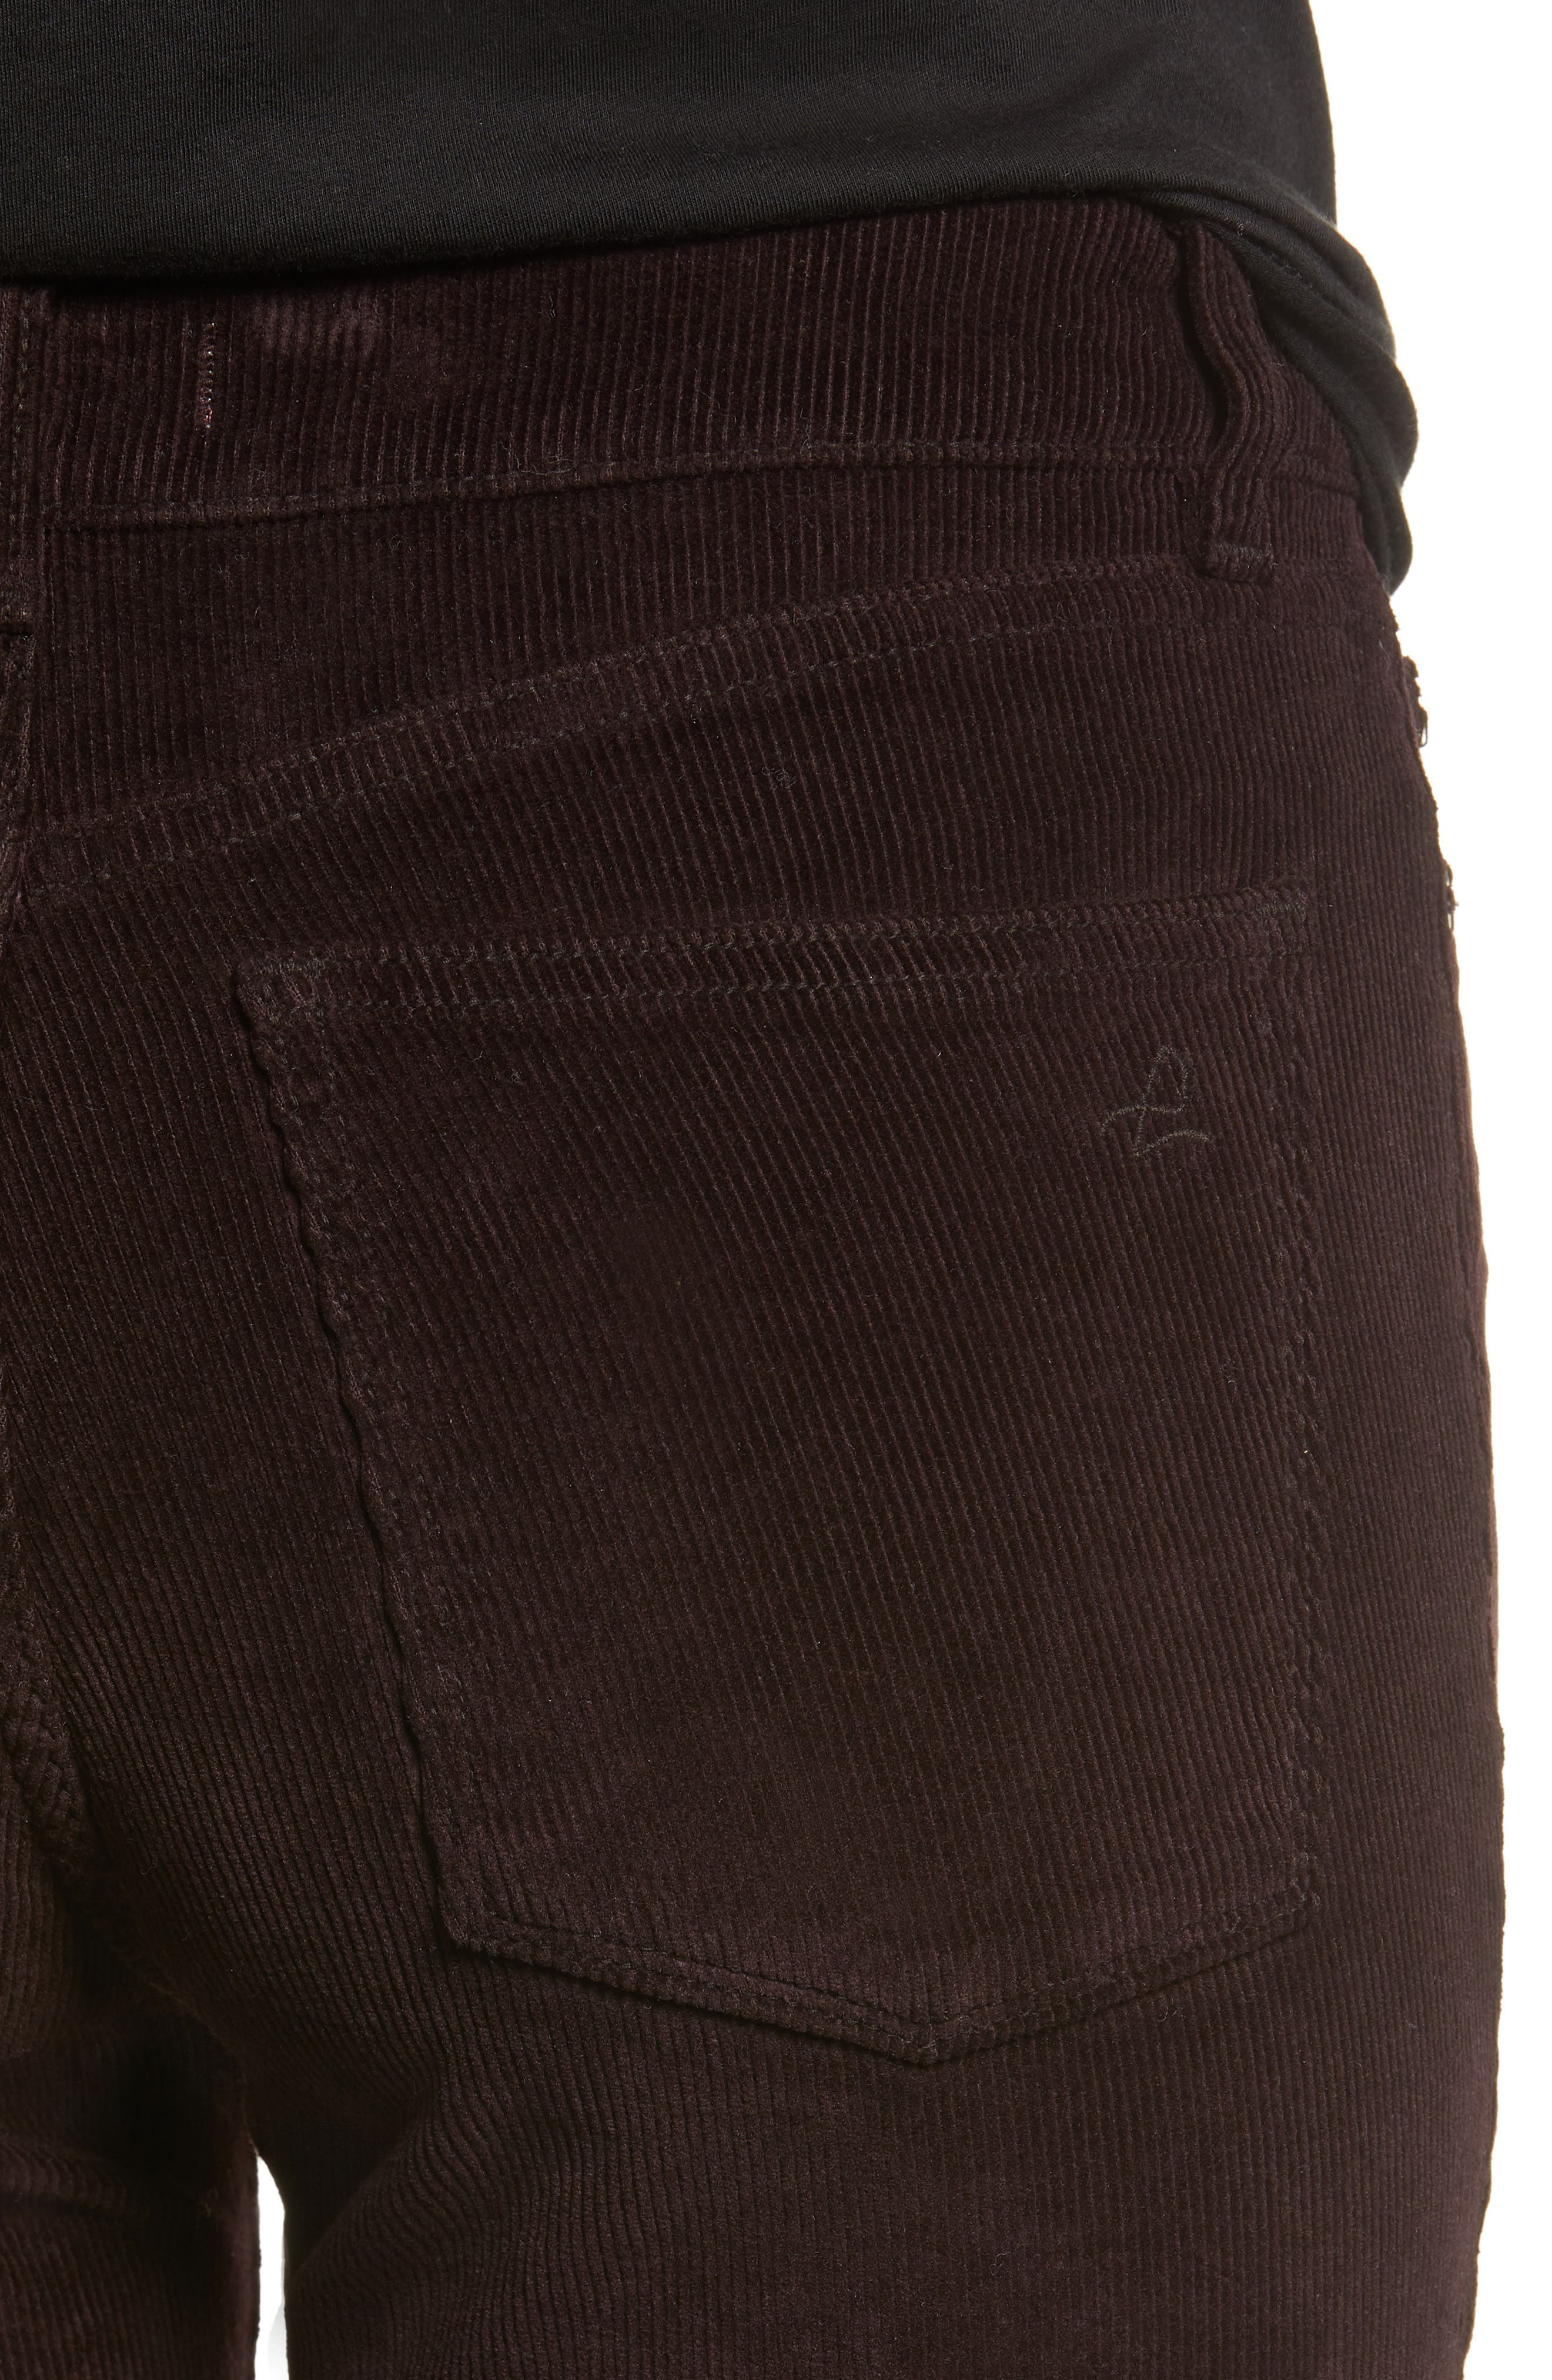 Farrow High Waist Ankle Skinny Corduroy Pants,                             Alternate thumbnail 4, color,                             BIRCH LAKE